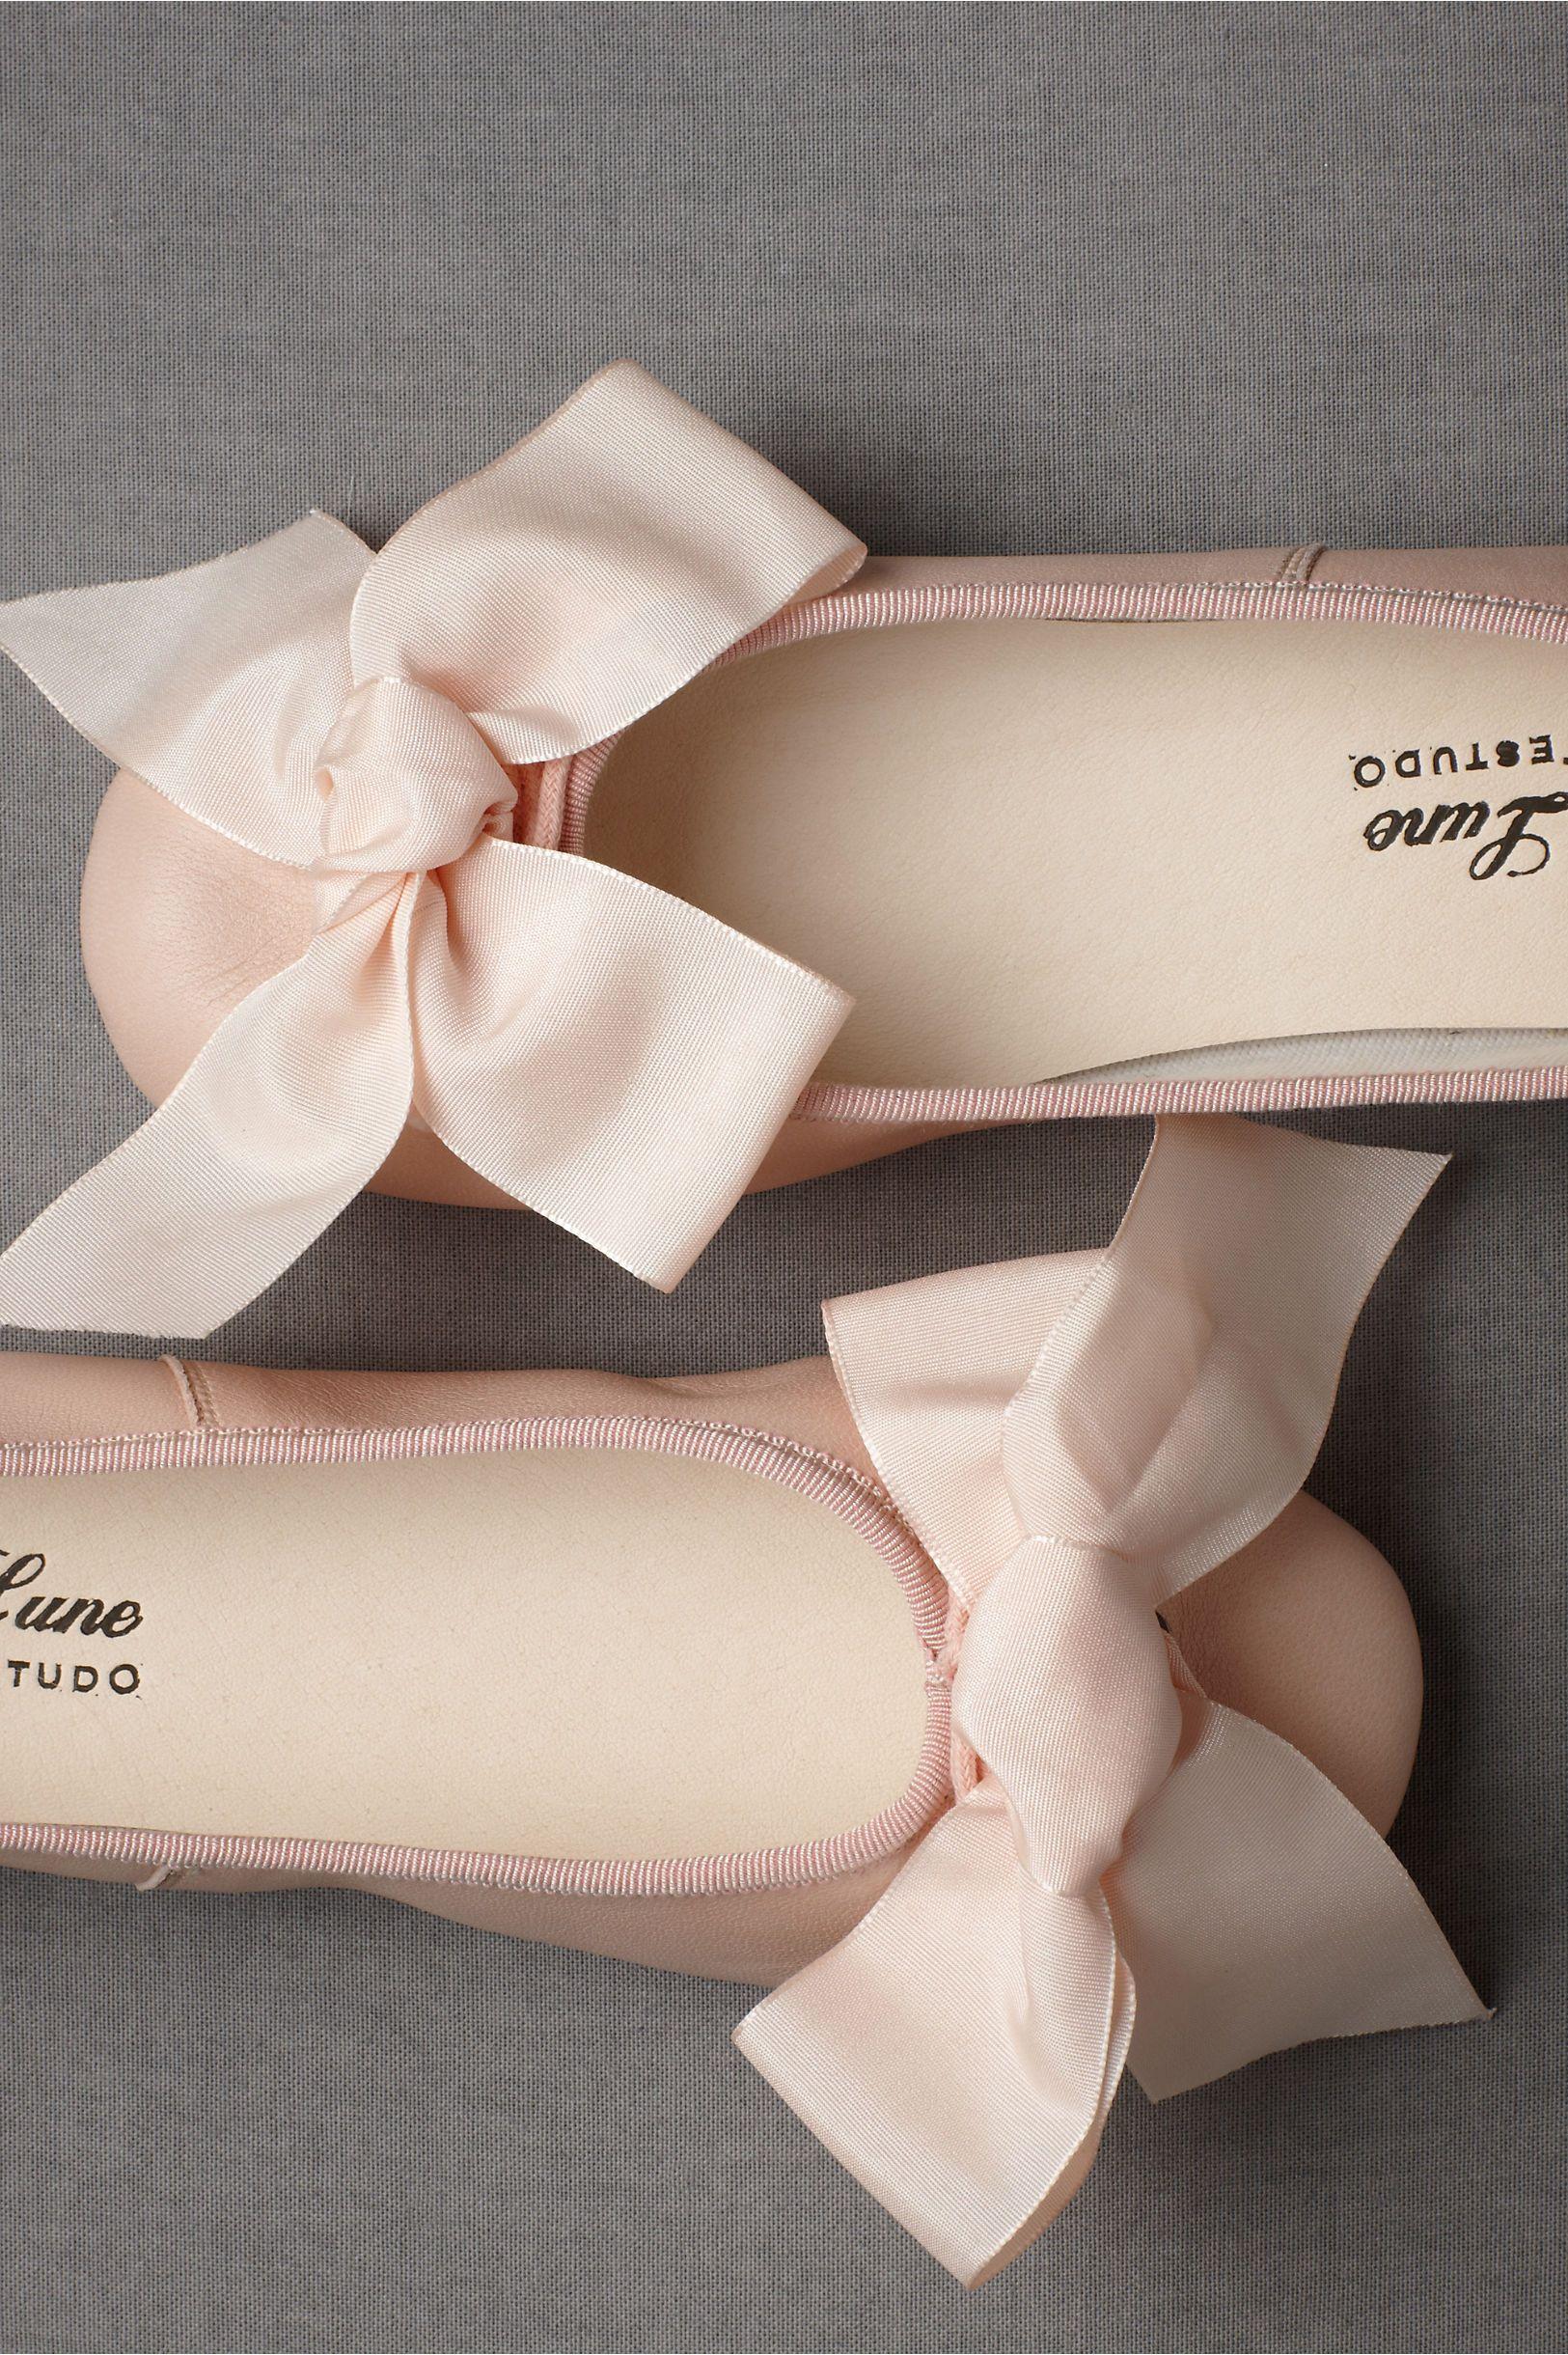 BHLDN Parisian ballet flats, $250.